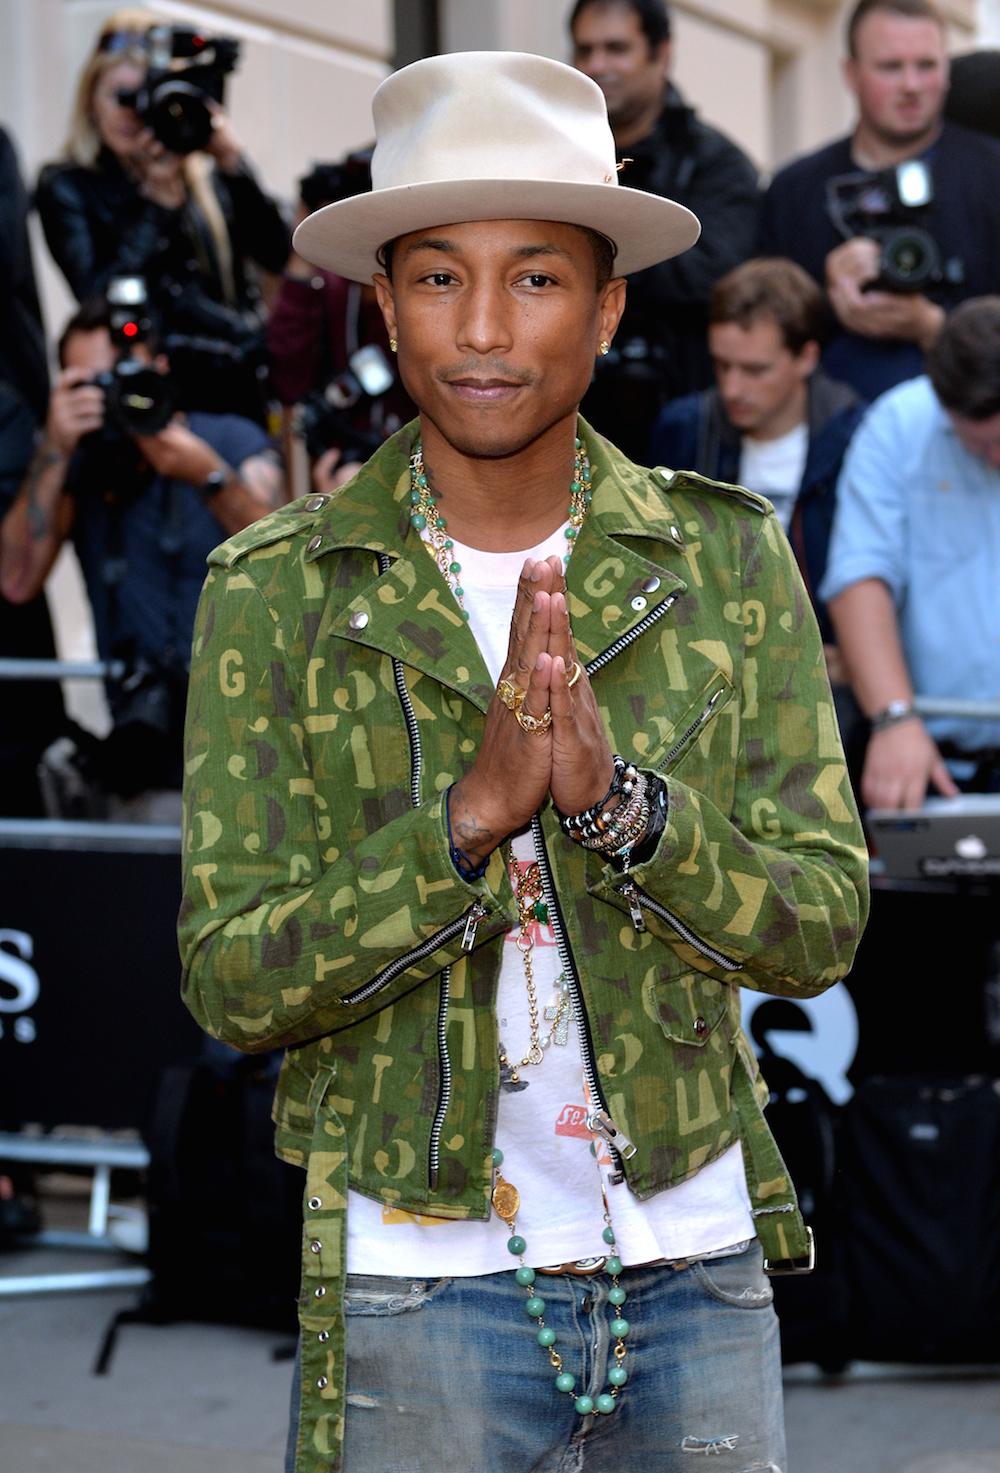 Pharrell Wiliams - GQ Men Of The Year Awards - Red Carpet Arrivals